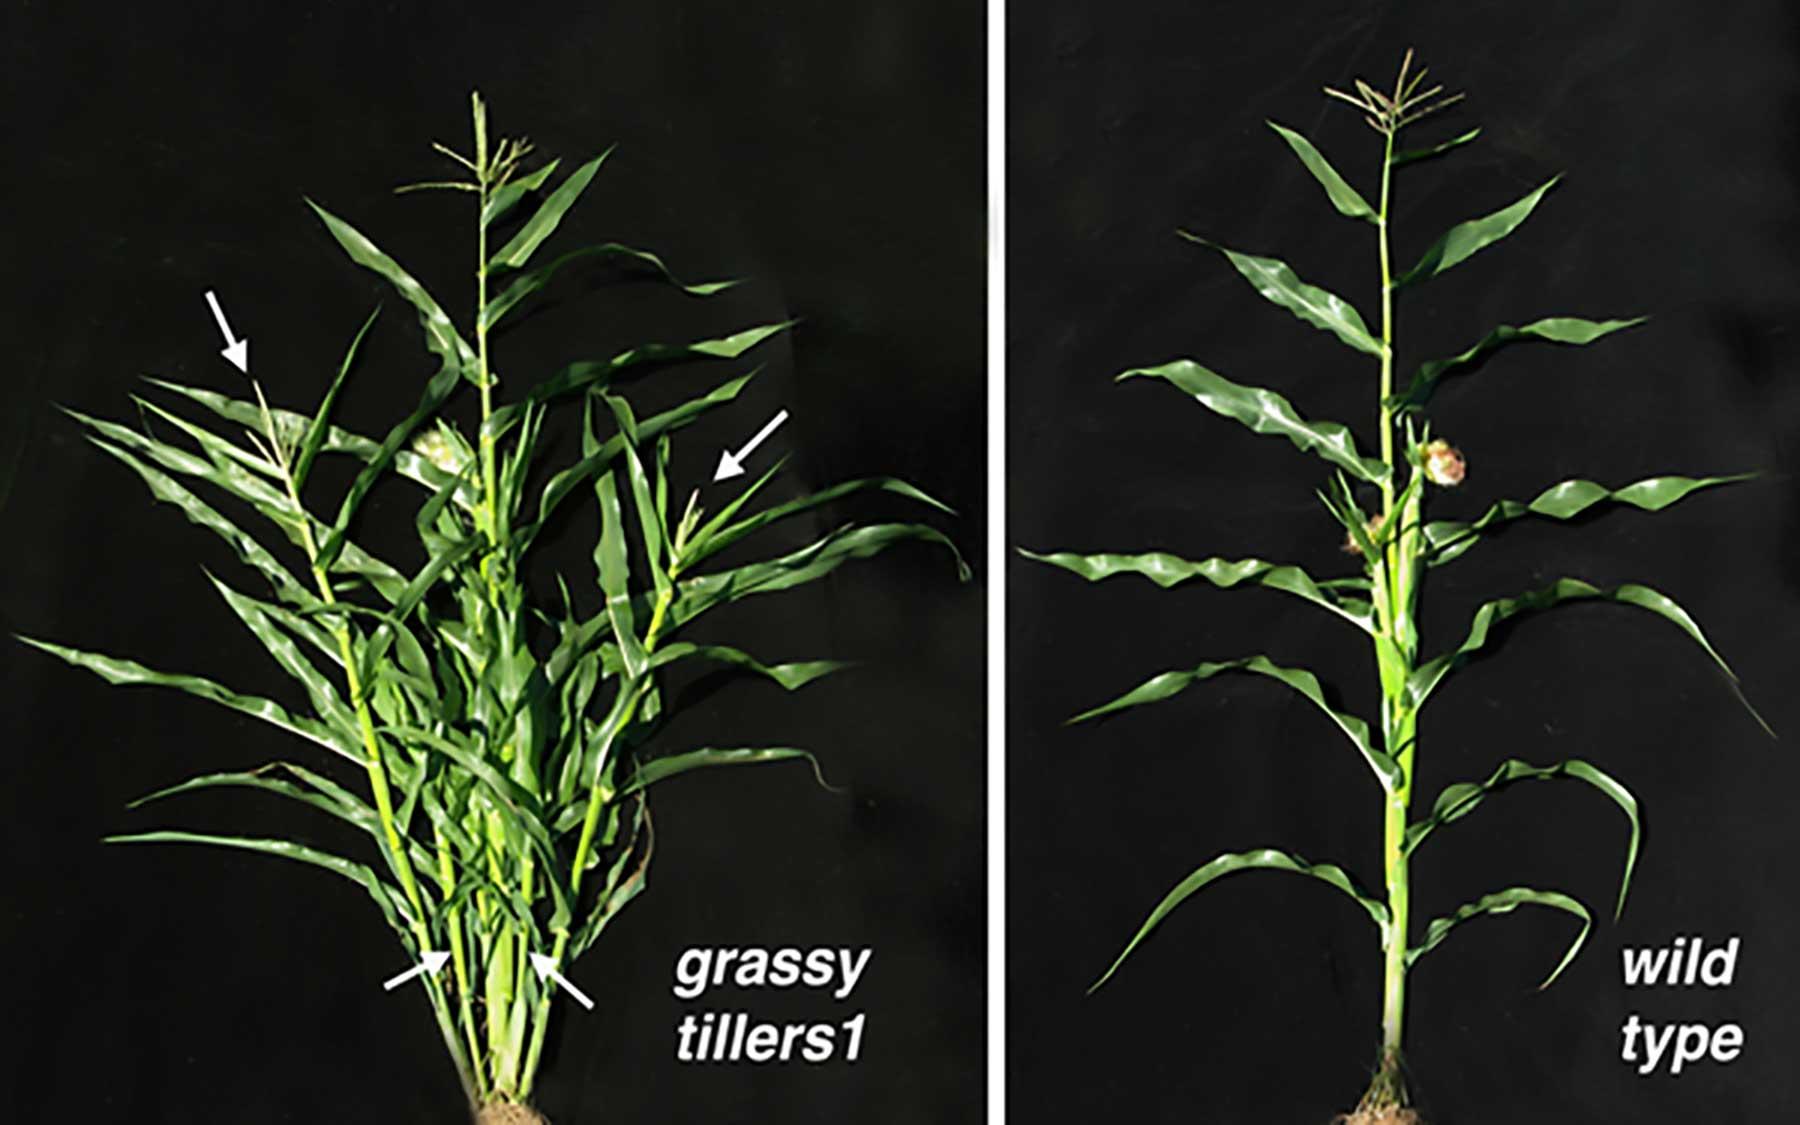 grassy tillers1